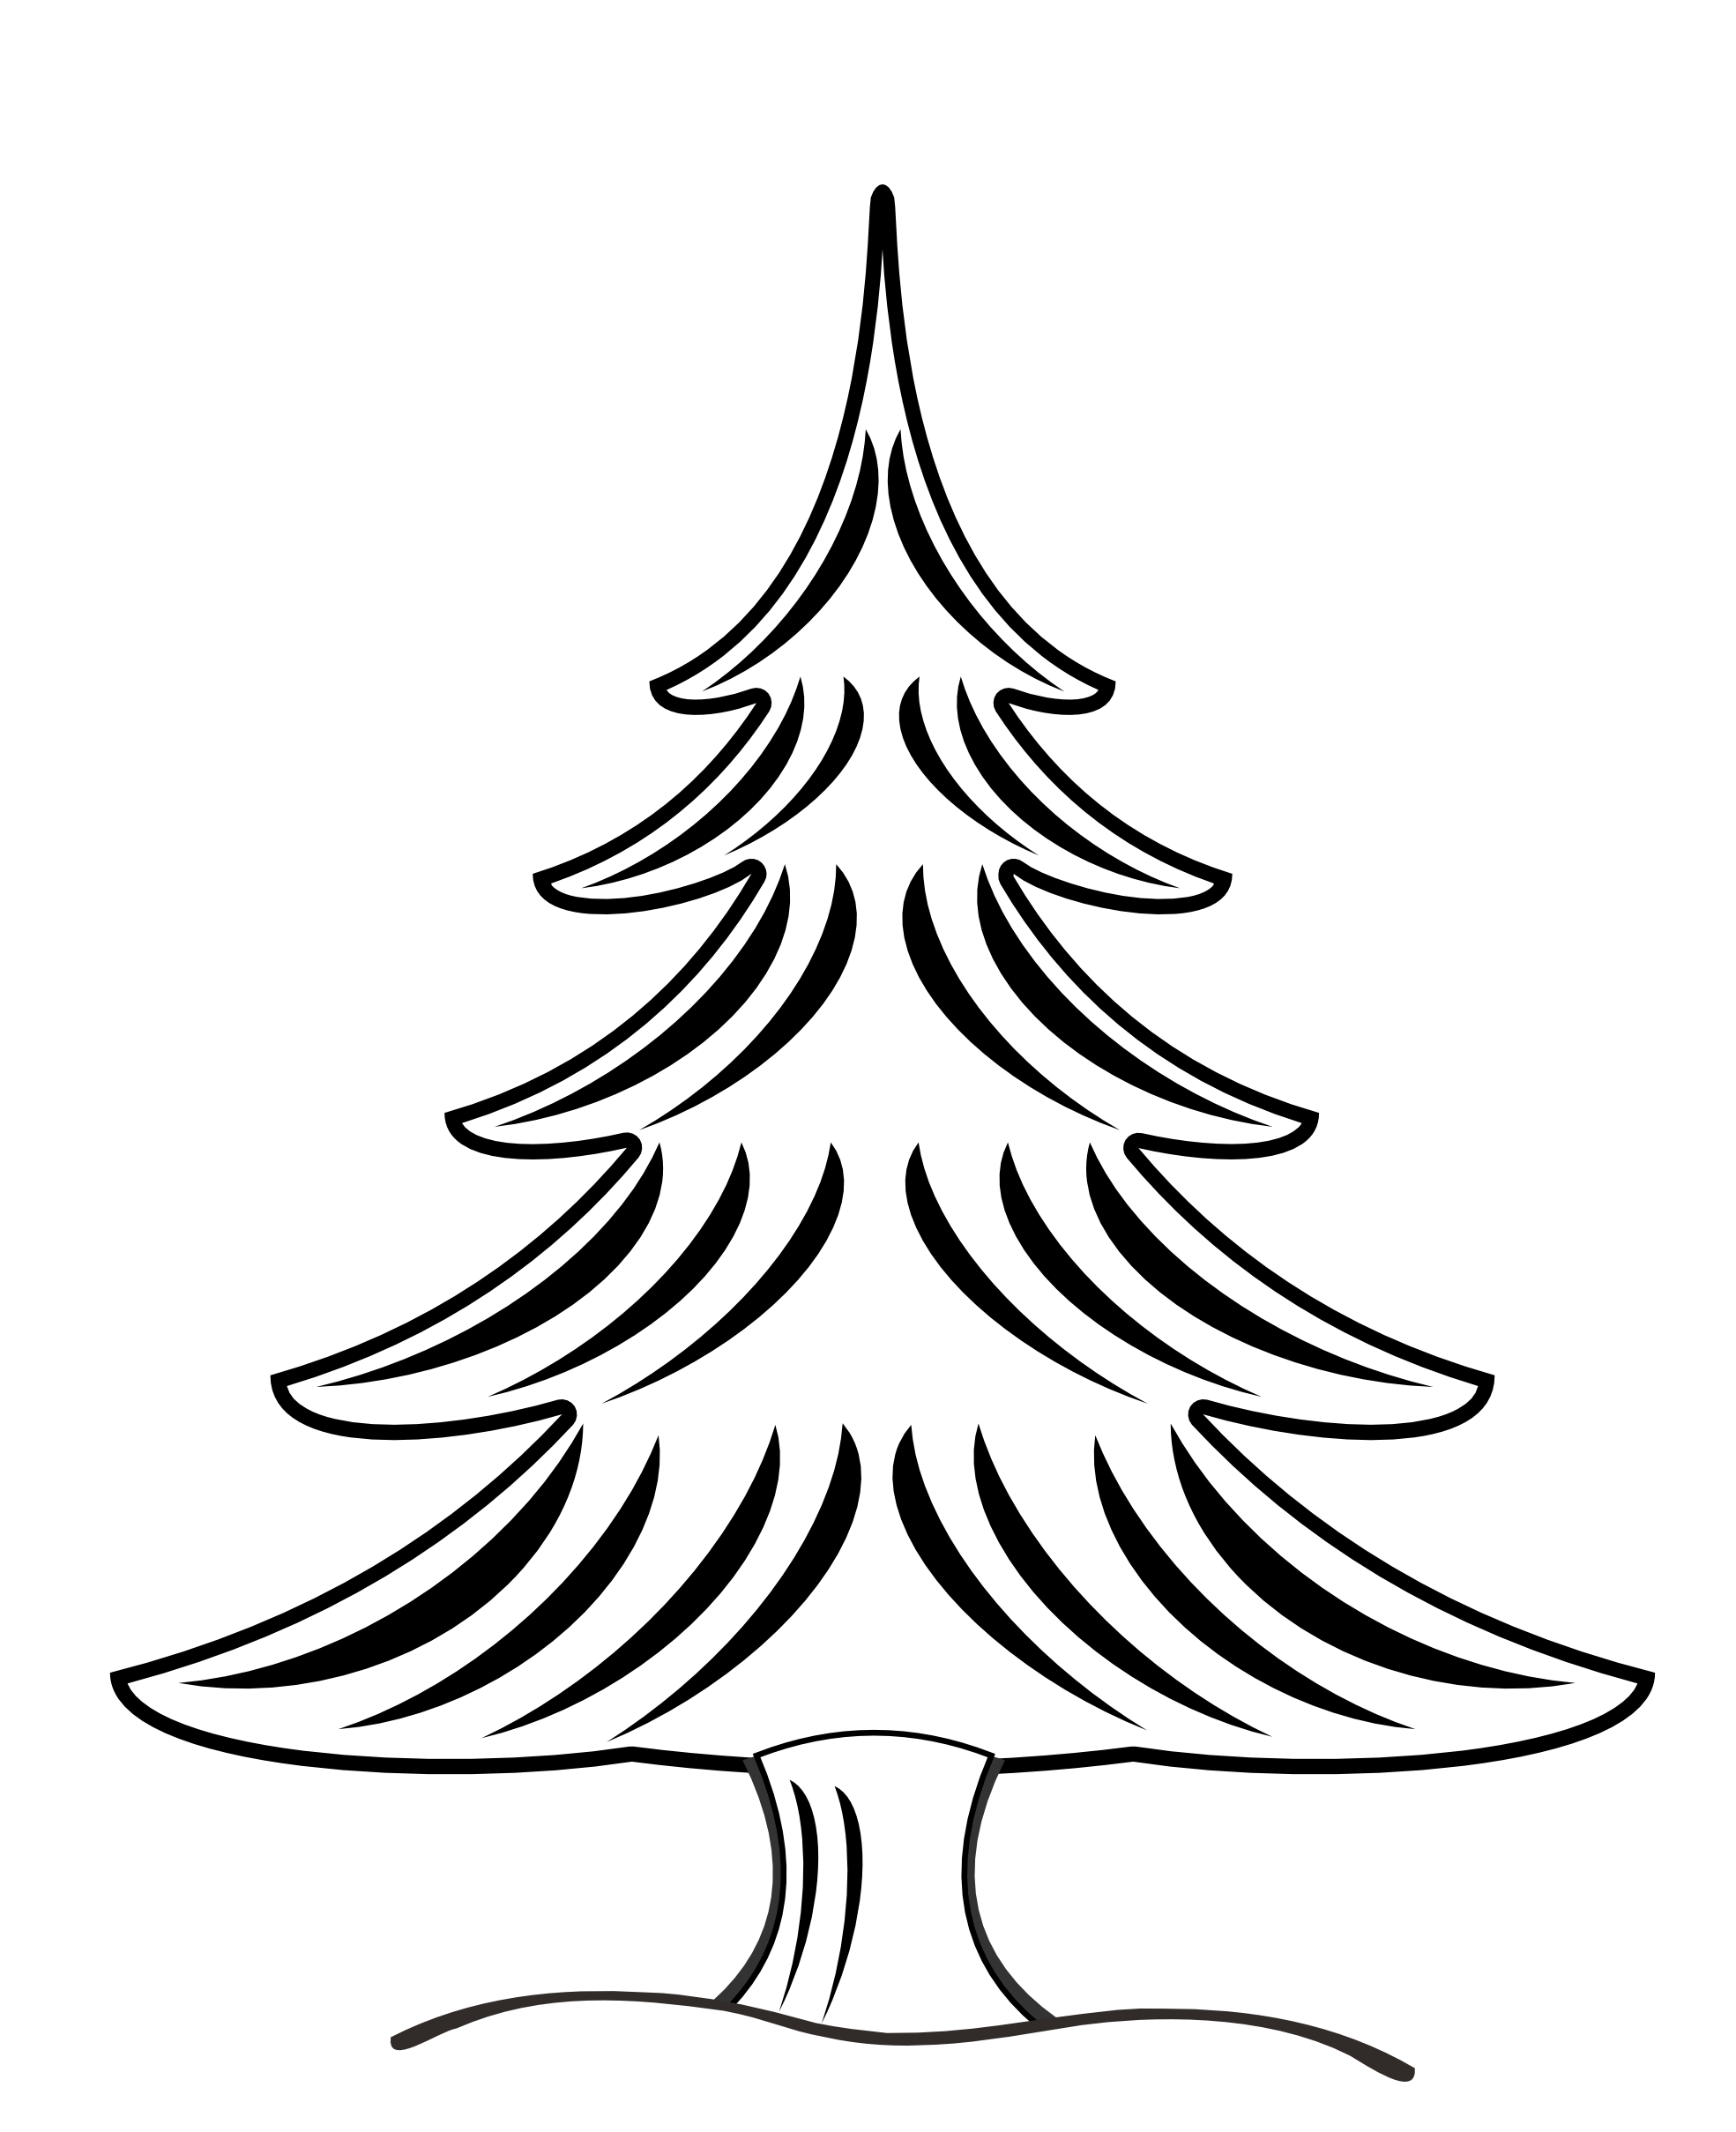 Fern clipart christmas tree. Treeline drawing at getdrawings